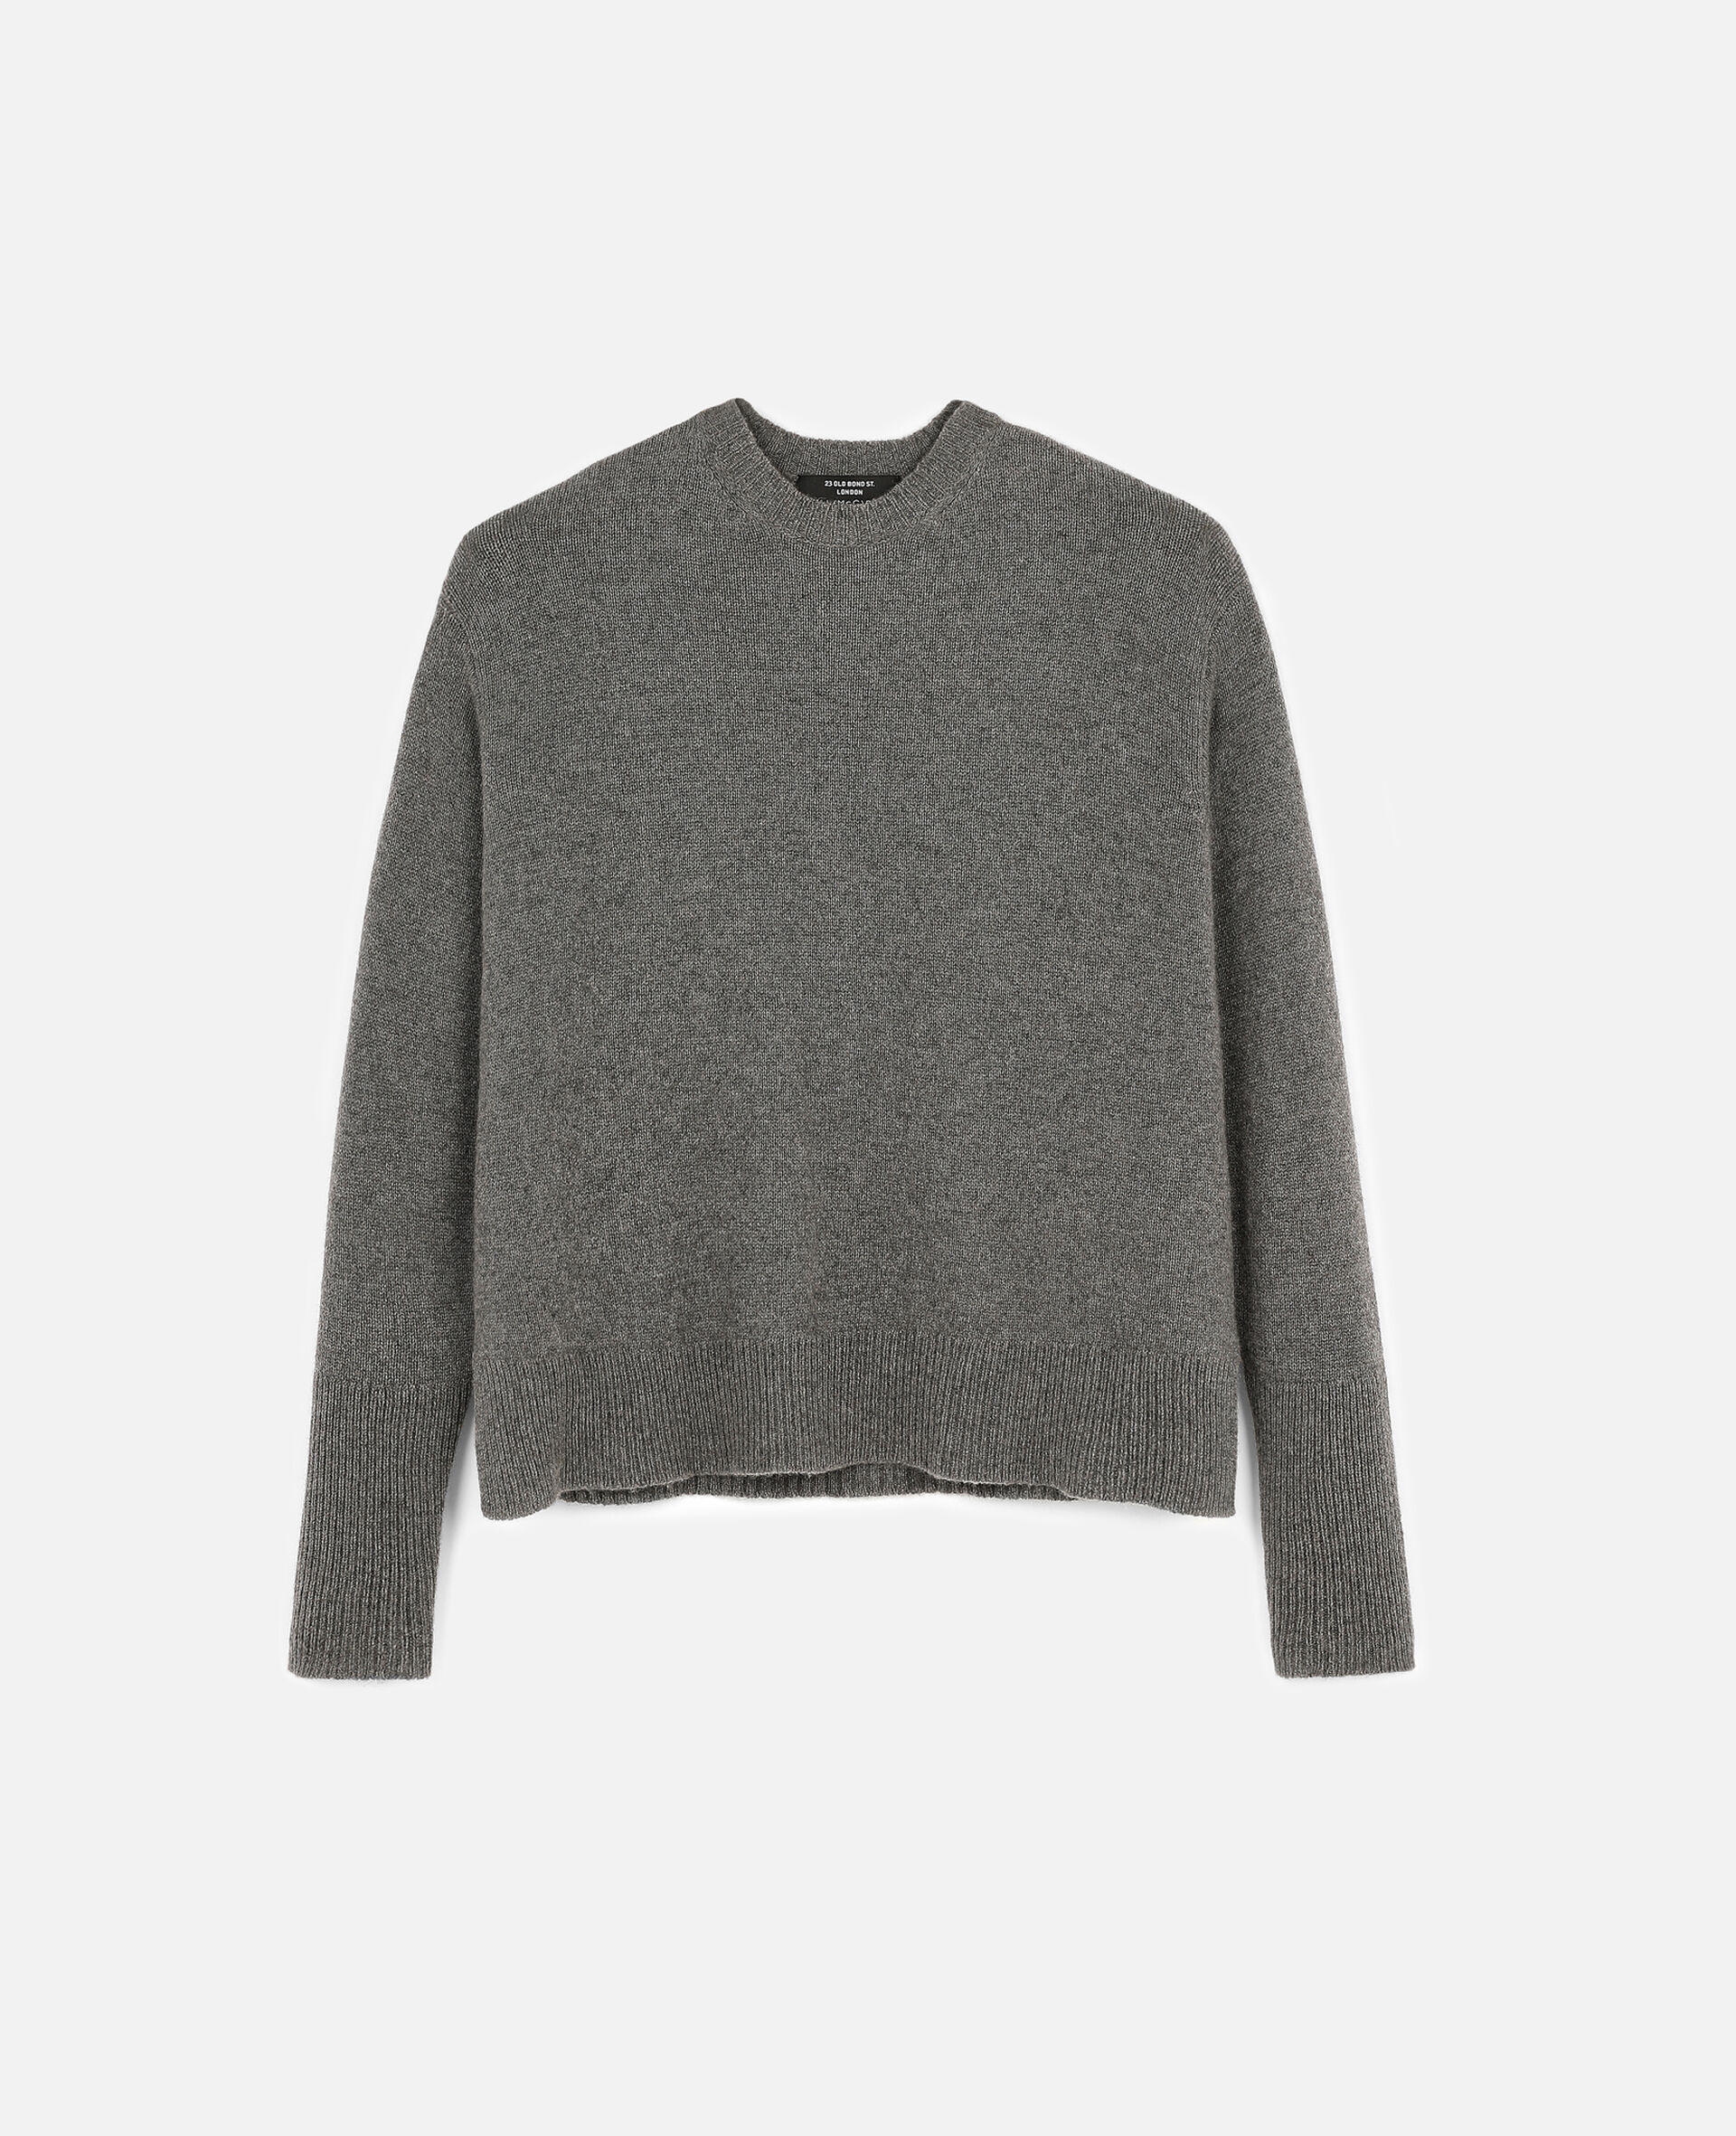 Regenerated Cashmere Sweater-Grey-large image number 0